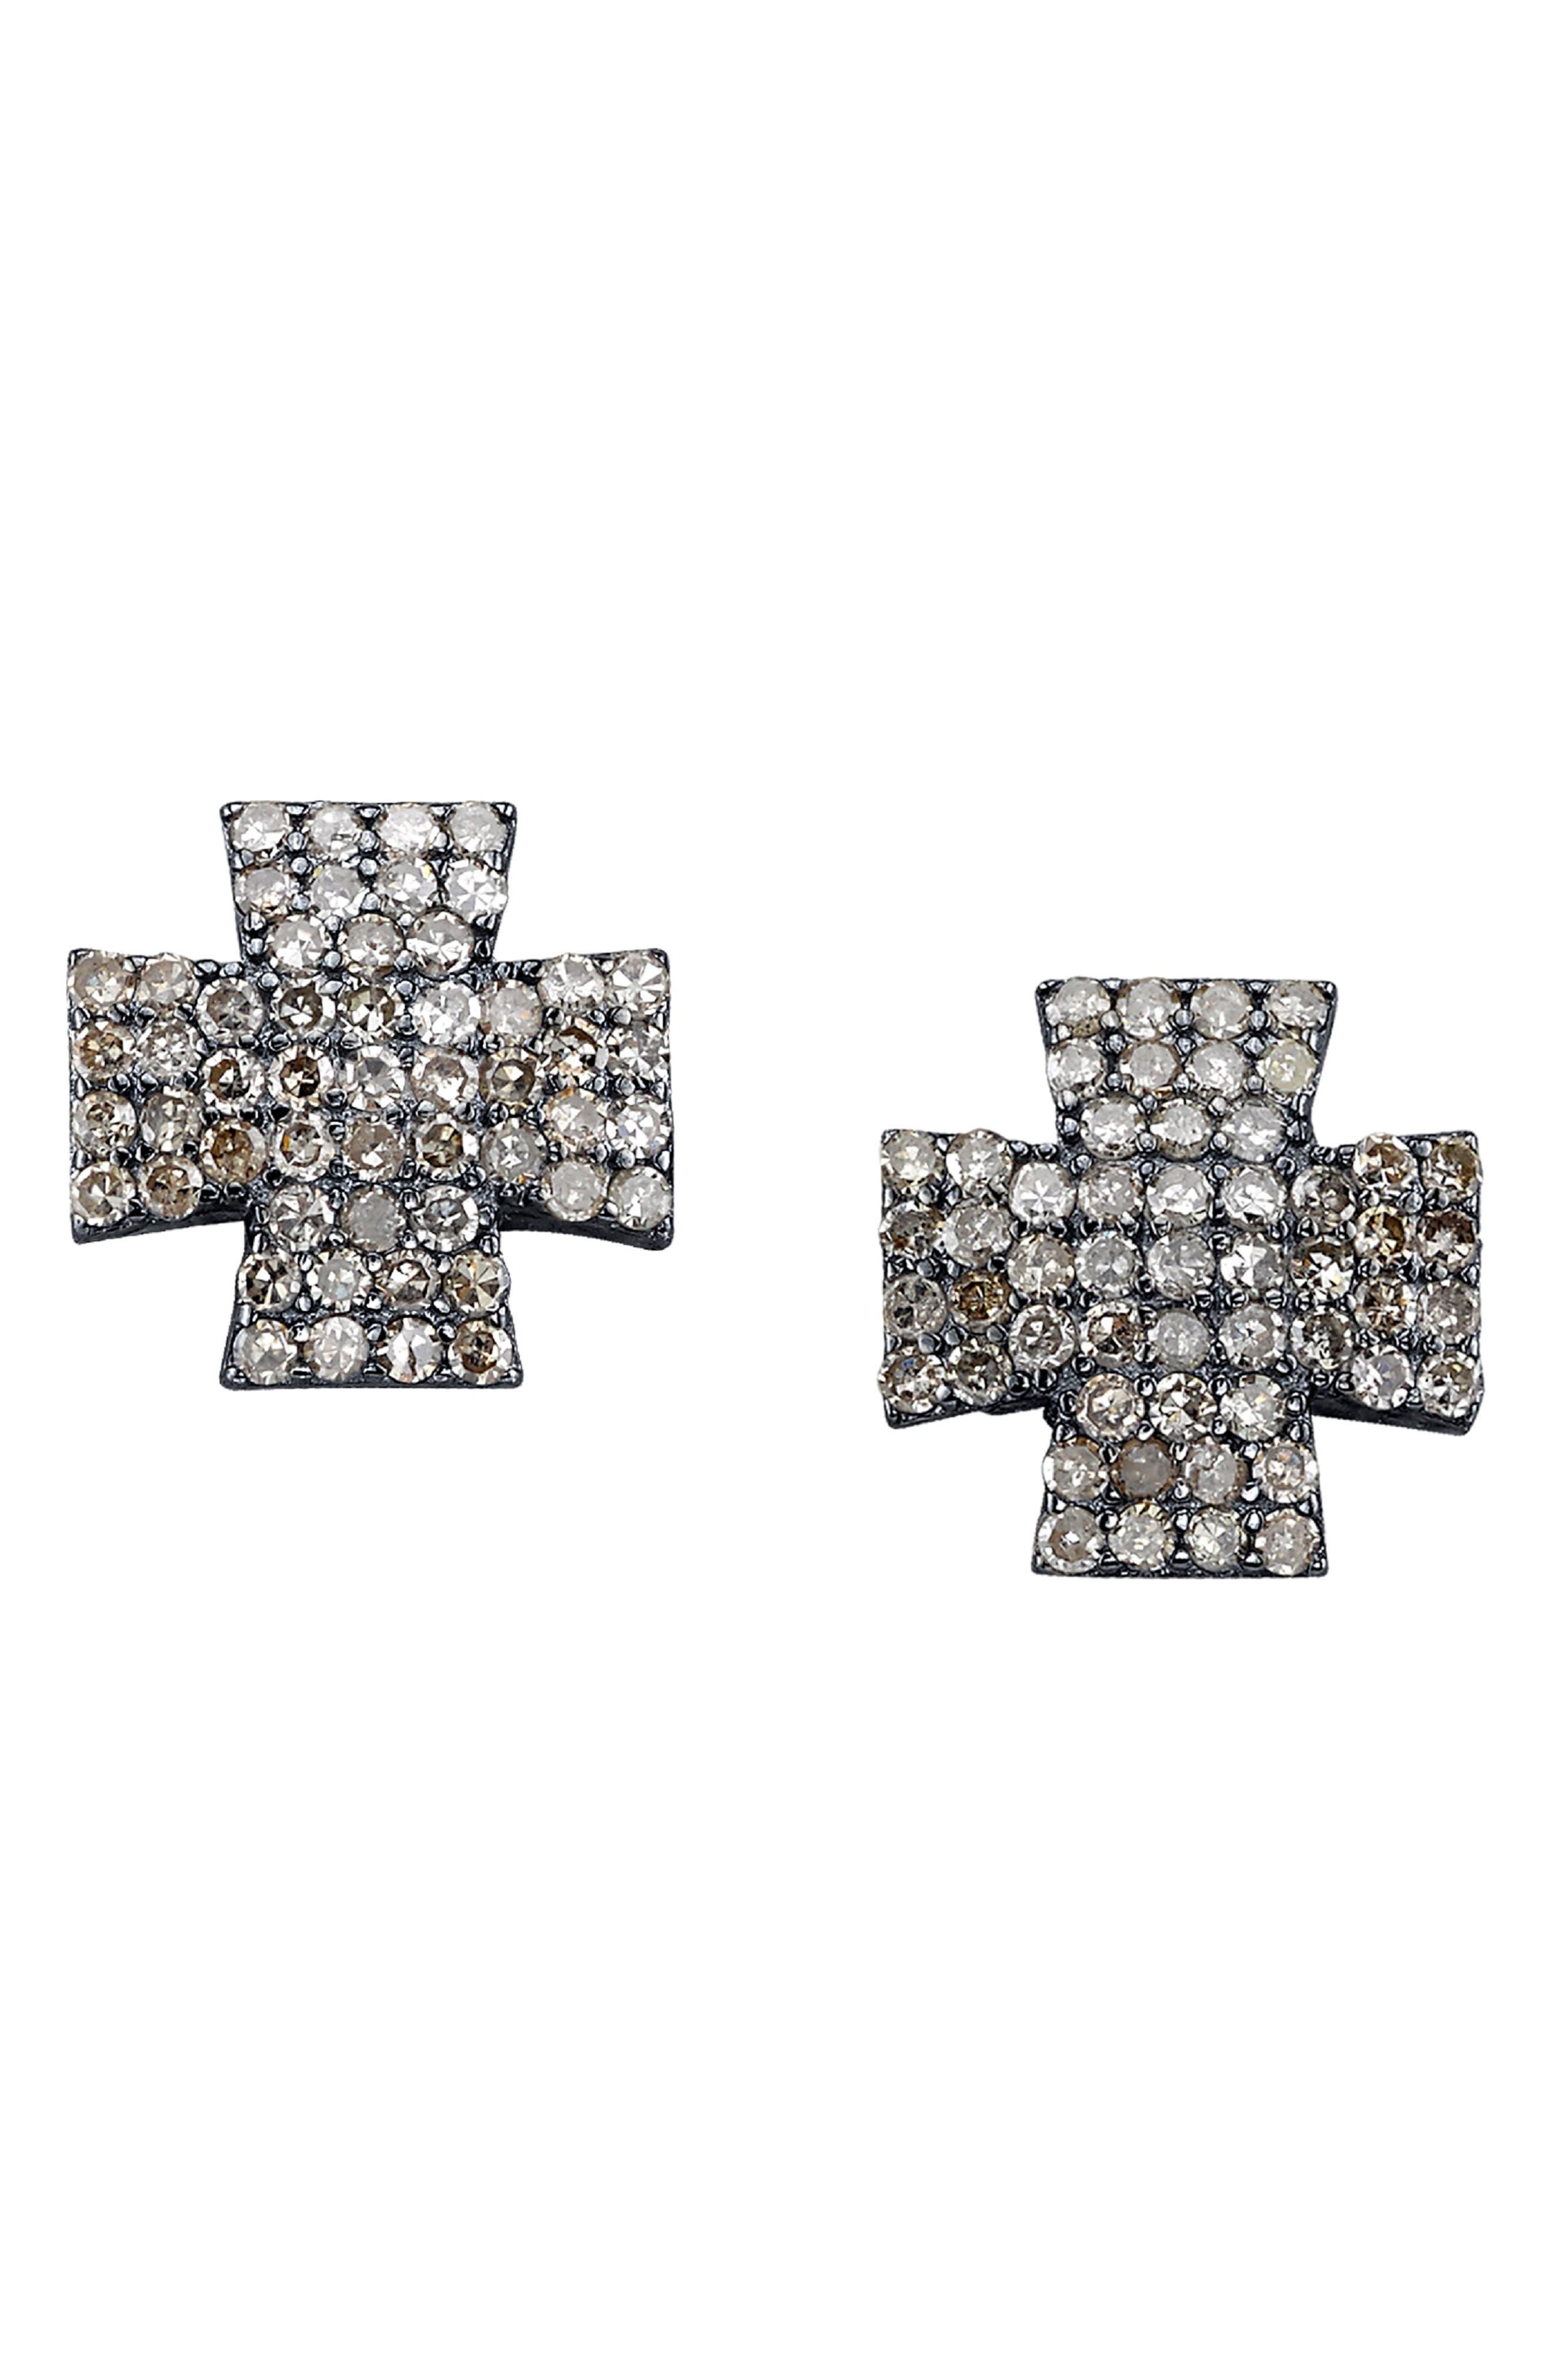 SHERYL LOWE Maltese Diamond Stud Earrings in Sterling Silver